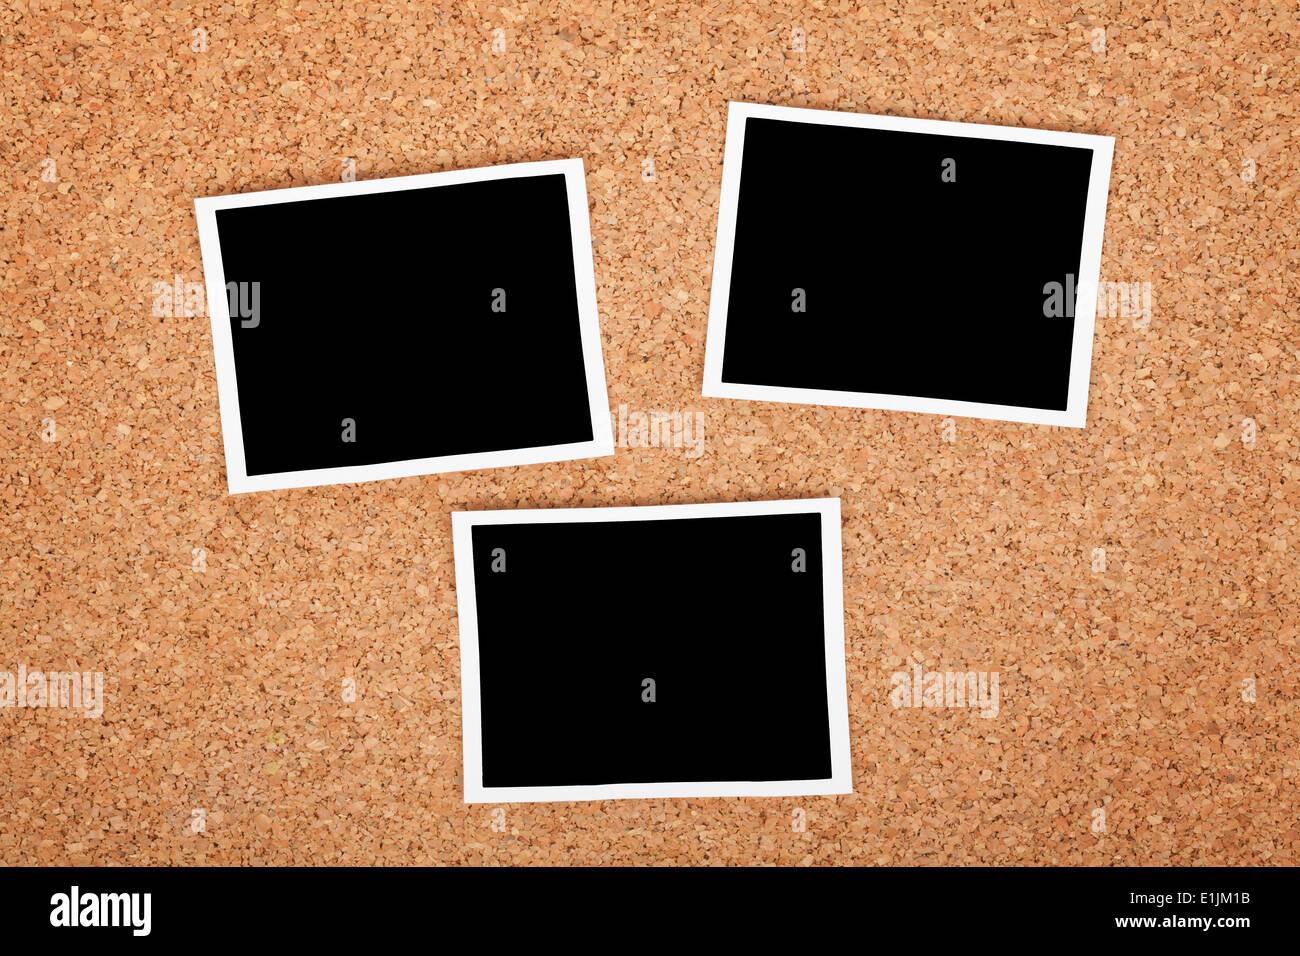 Polaroid photo frames on cork texture background - Stock Image